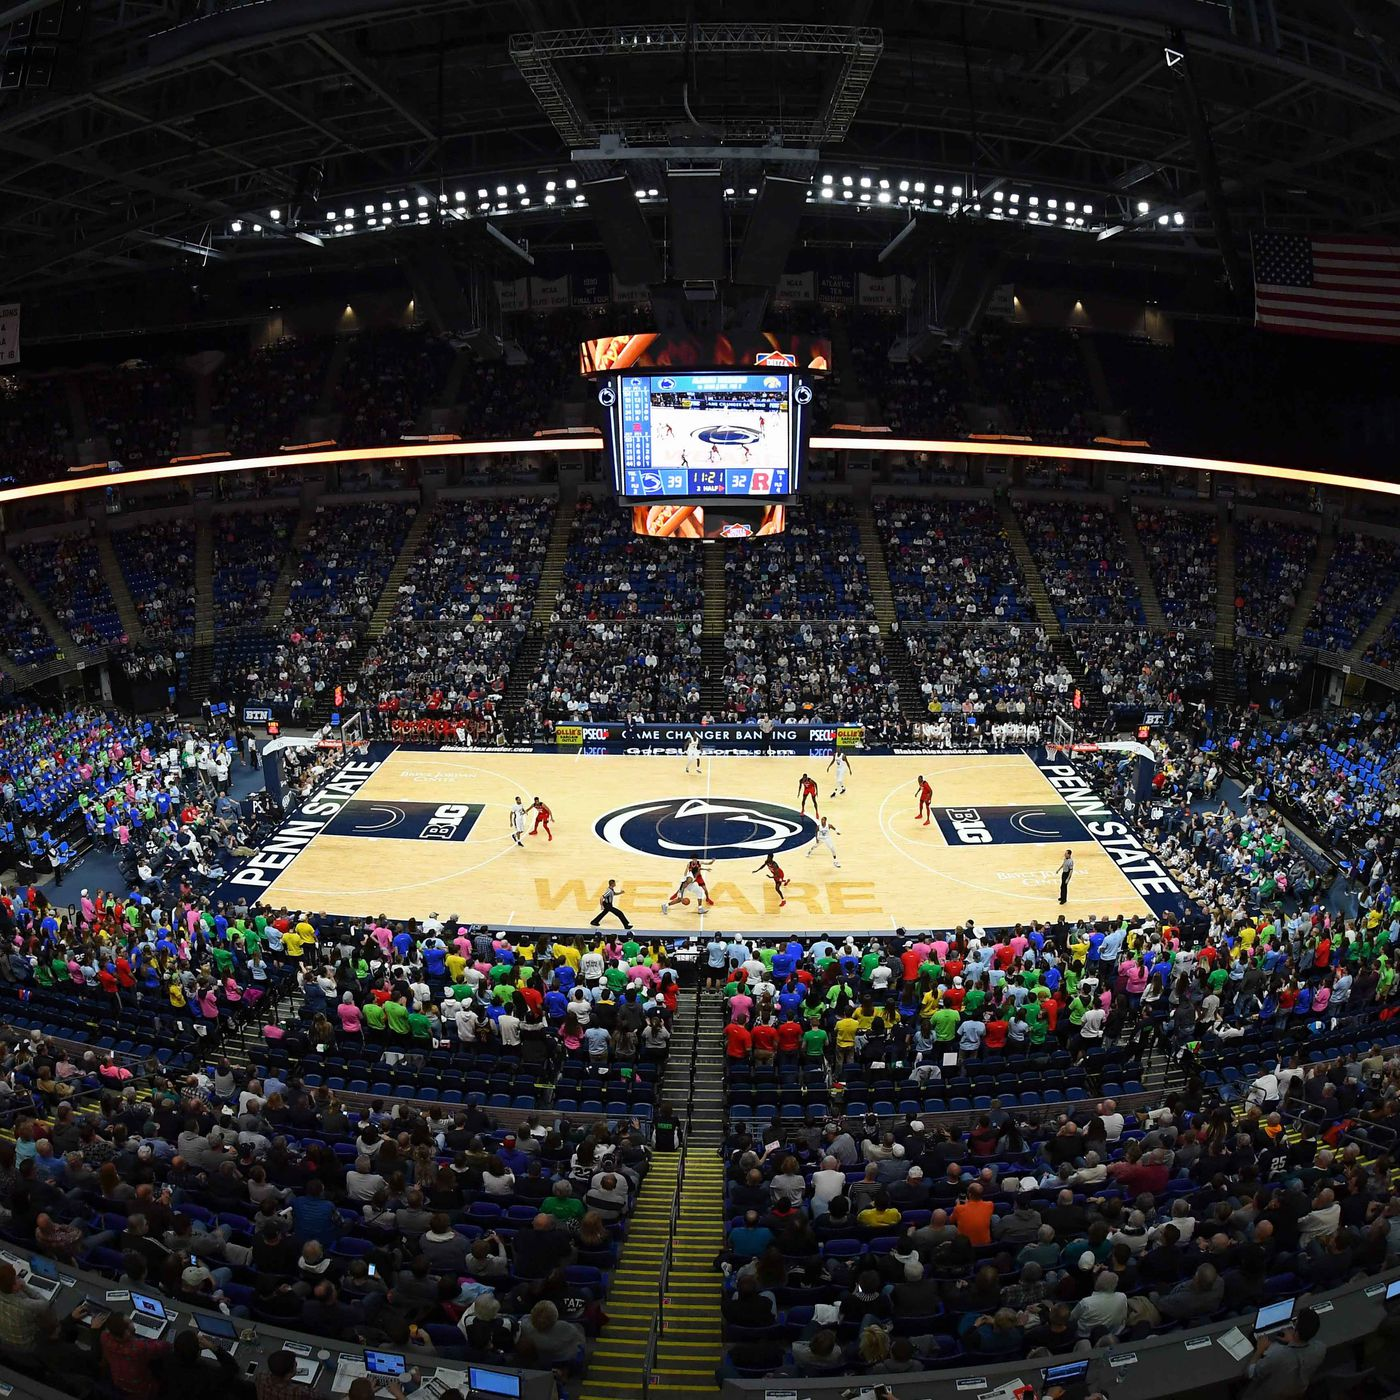 Jadeo legislación por supuesto  Will Penn State Fans Flock to the Bryce Jordan Center for the Big Ohio State  Game? - Black Shoe Diaries